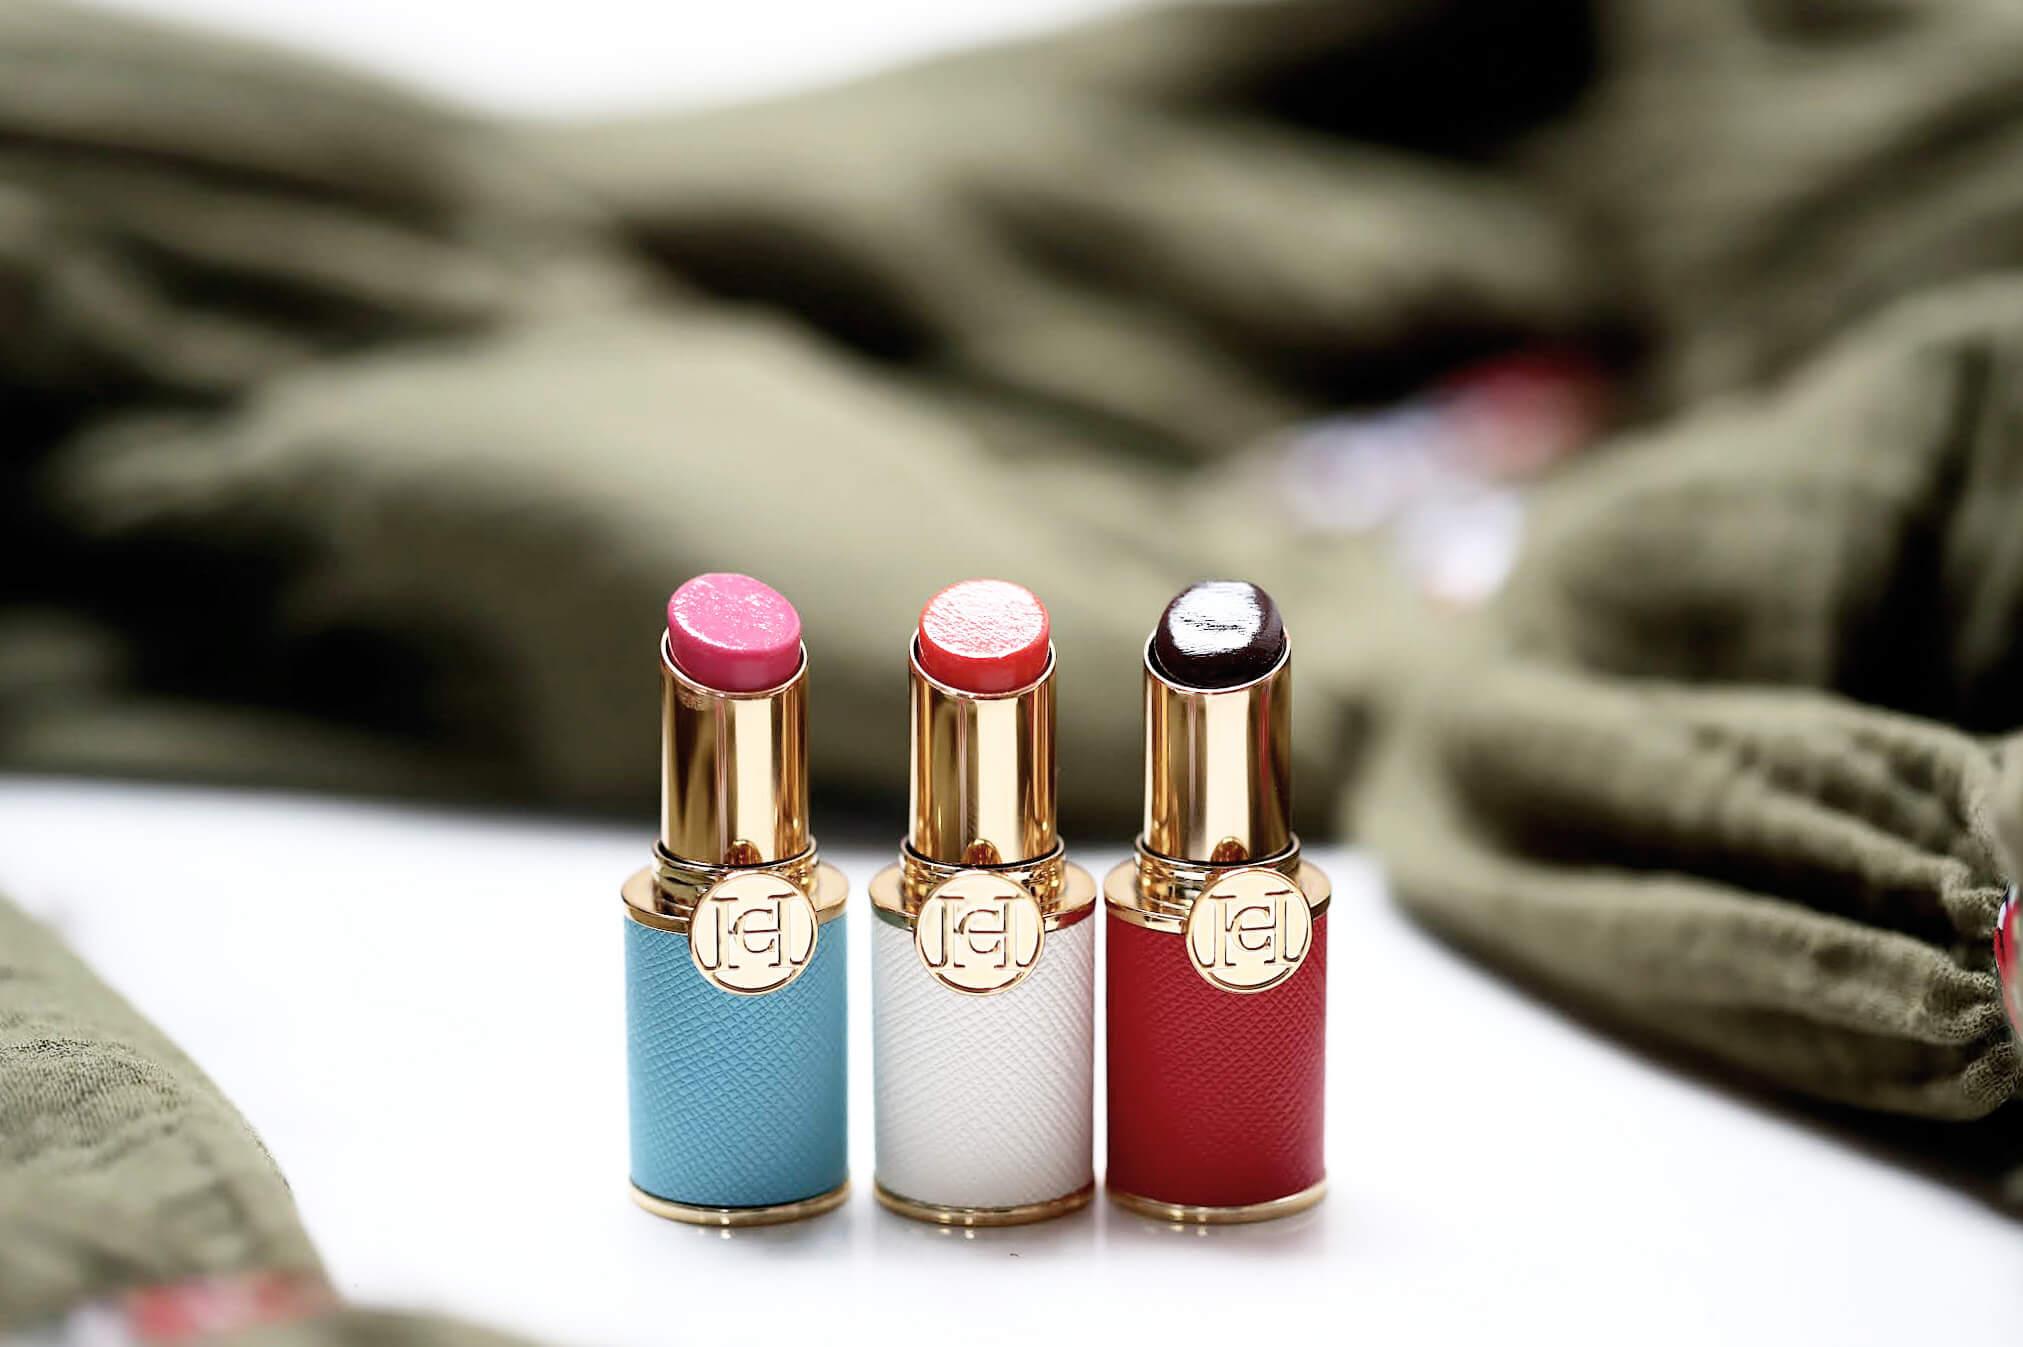 Carolina Herrera Mini Lip Tint Baume à Lèvres 001 004 005 swatch